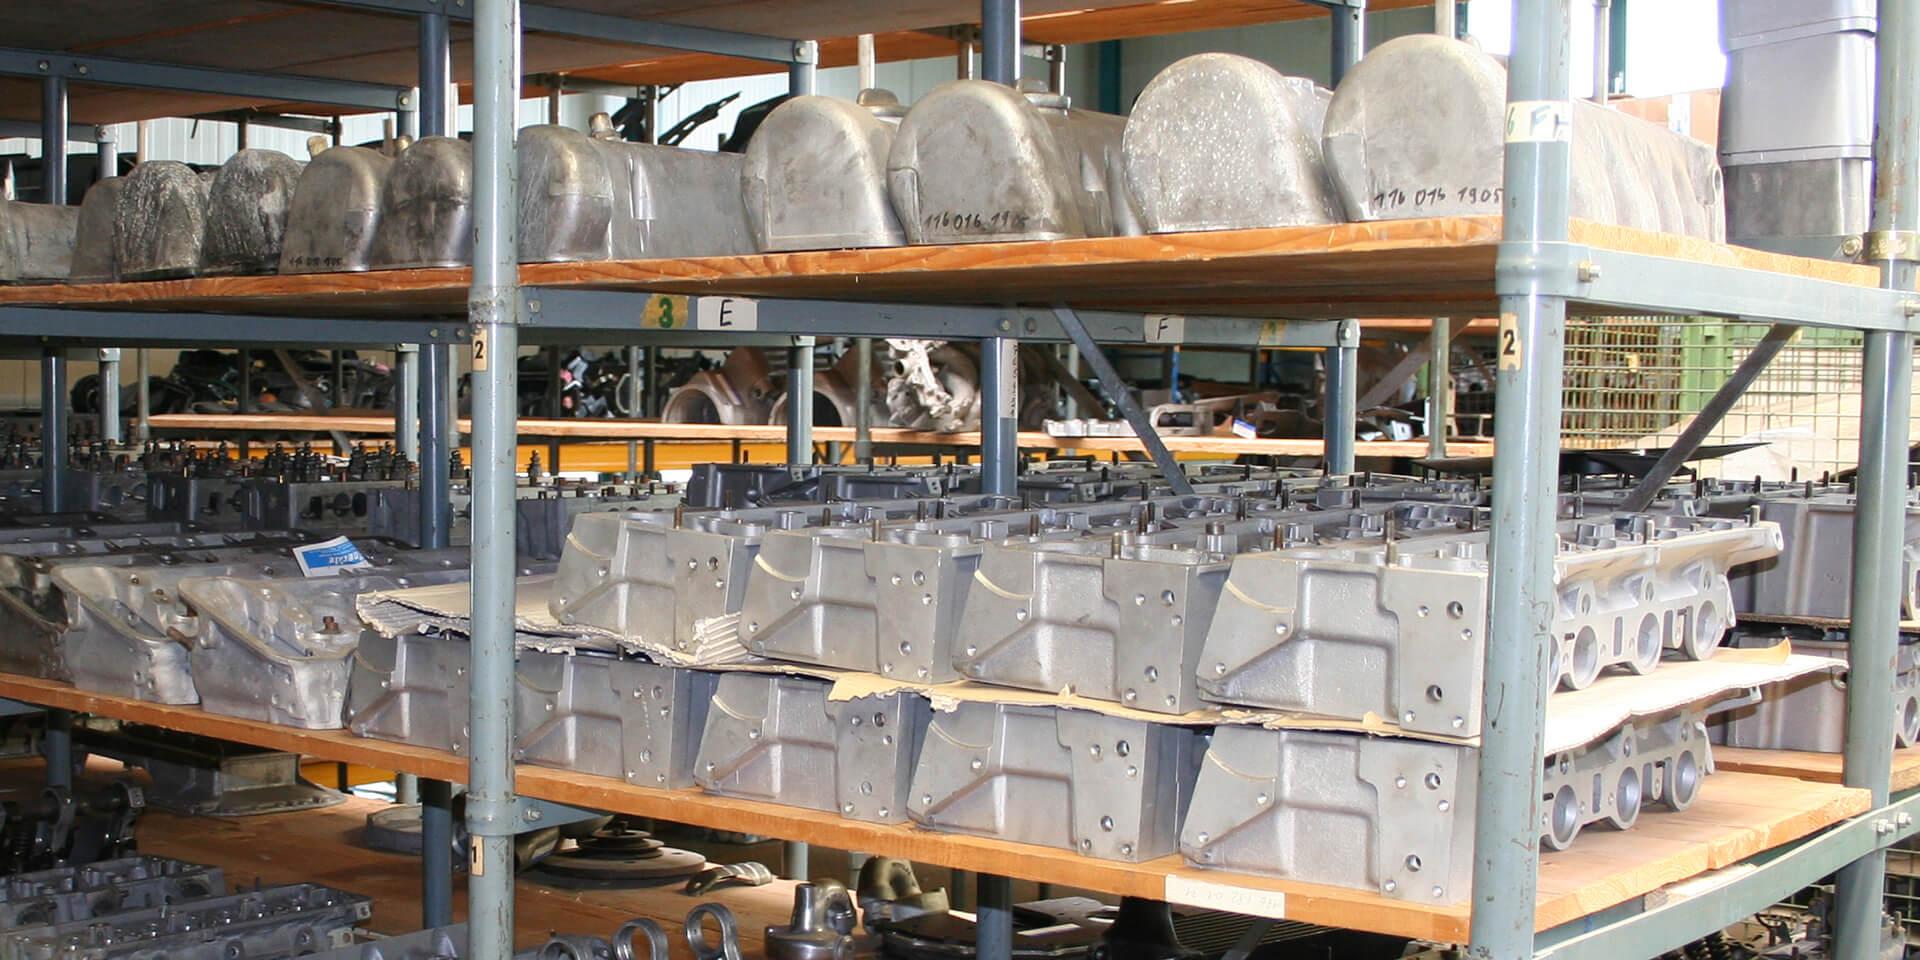 Vintage Mercedes cars – the Kienle replacement parts warehouse